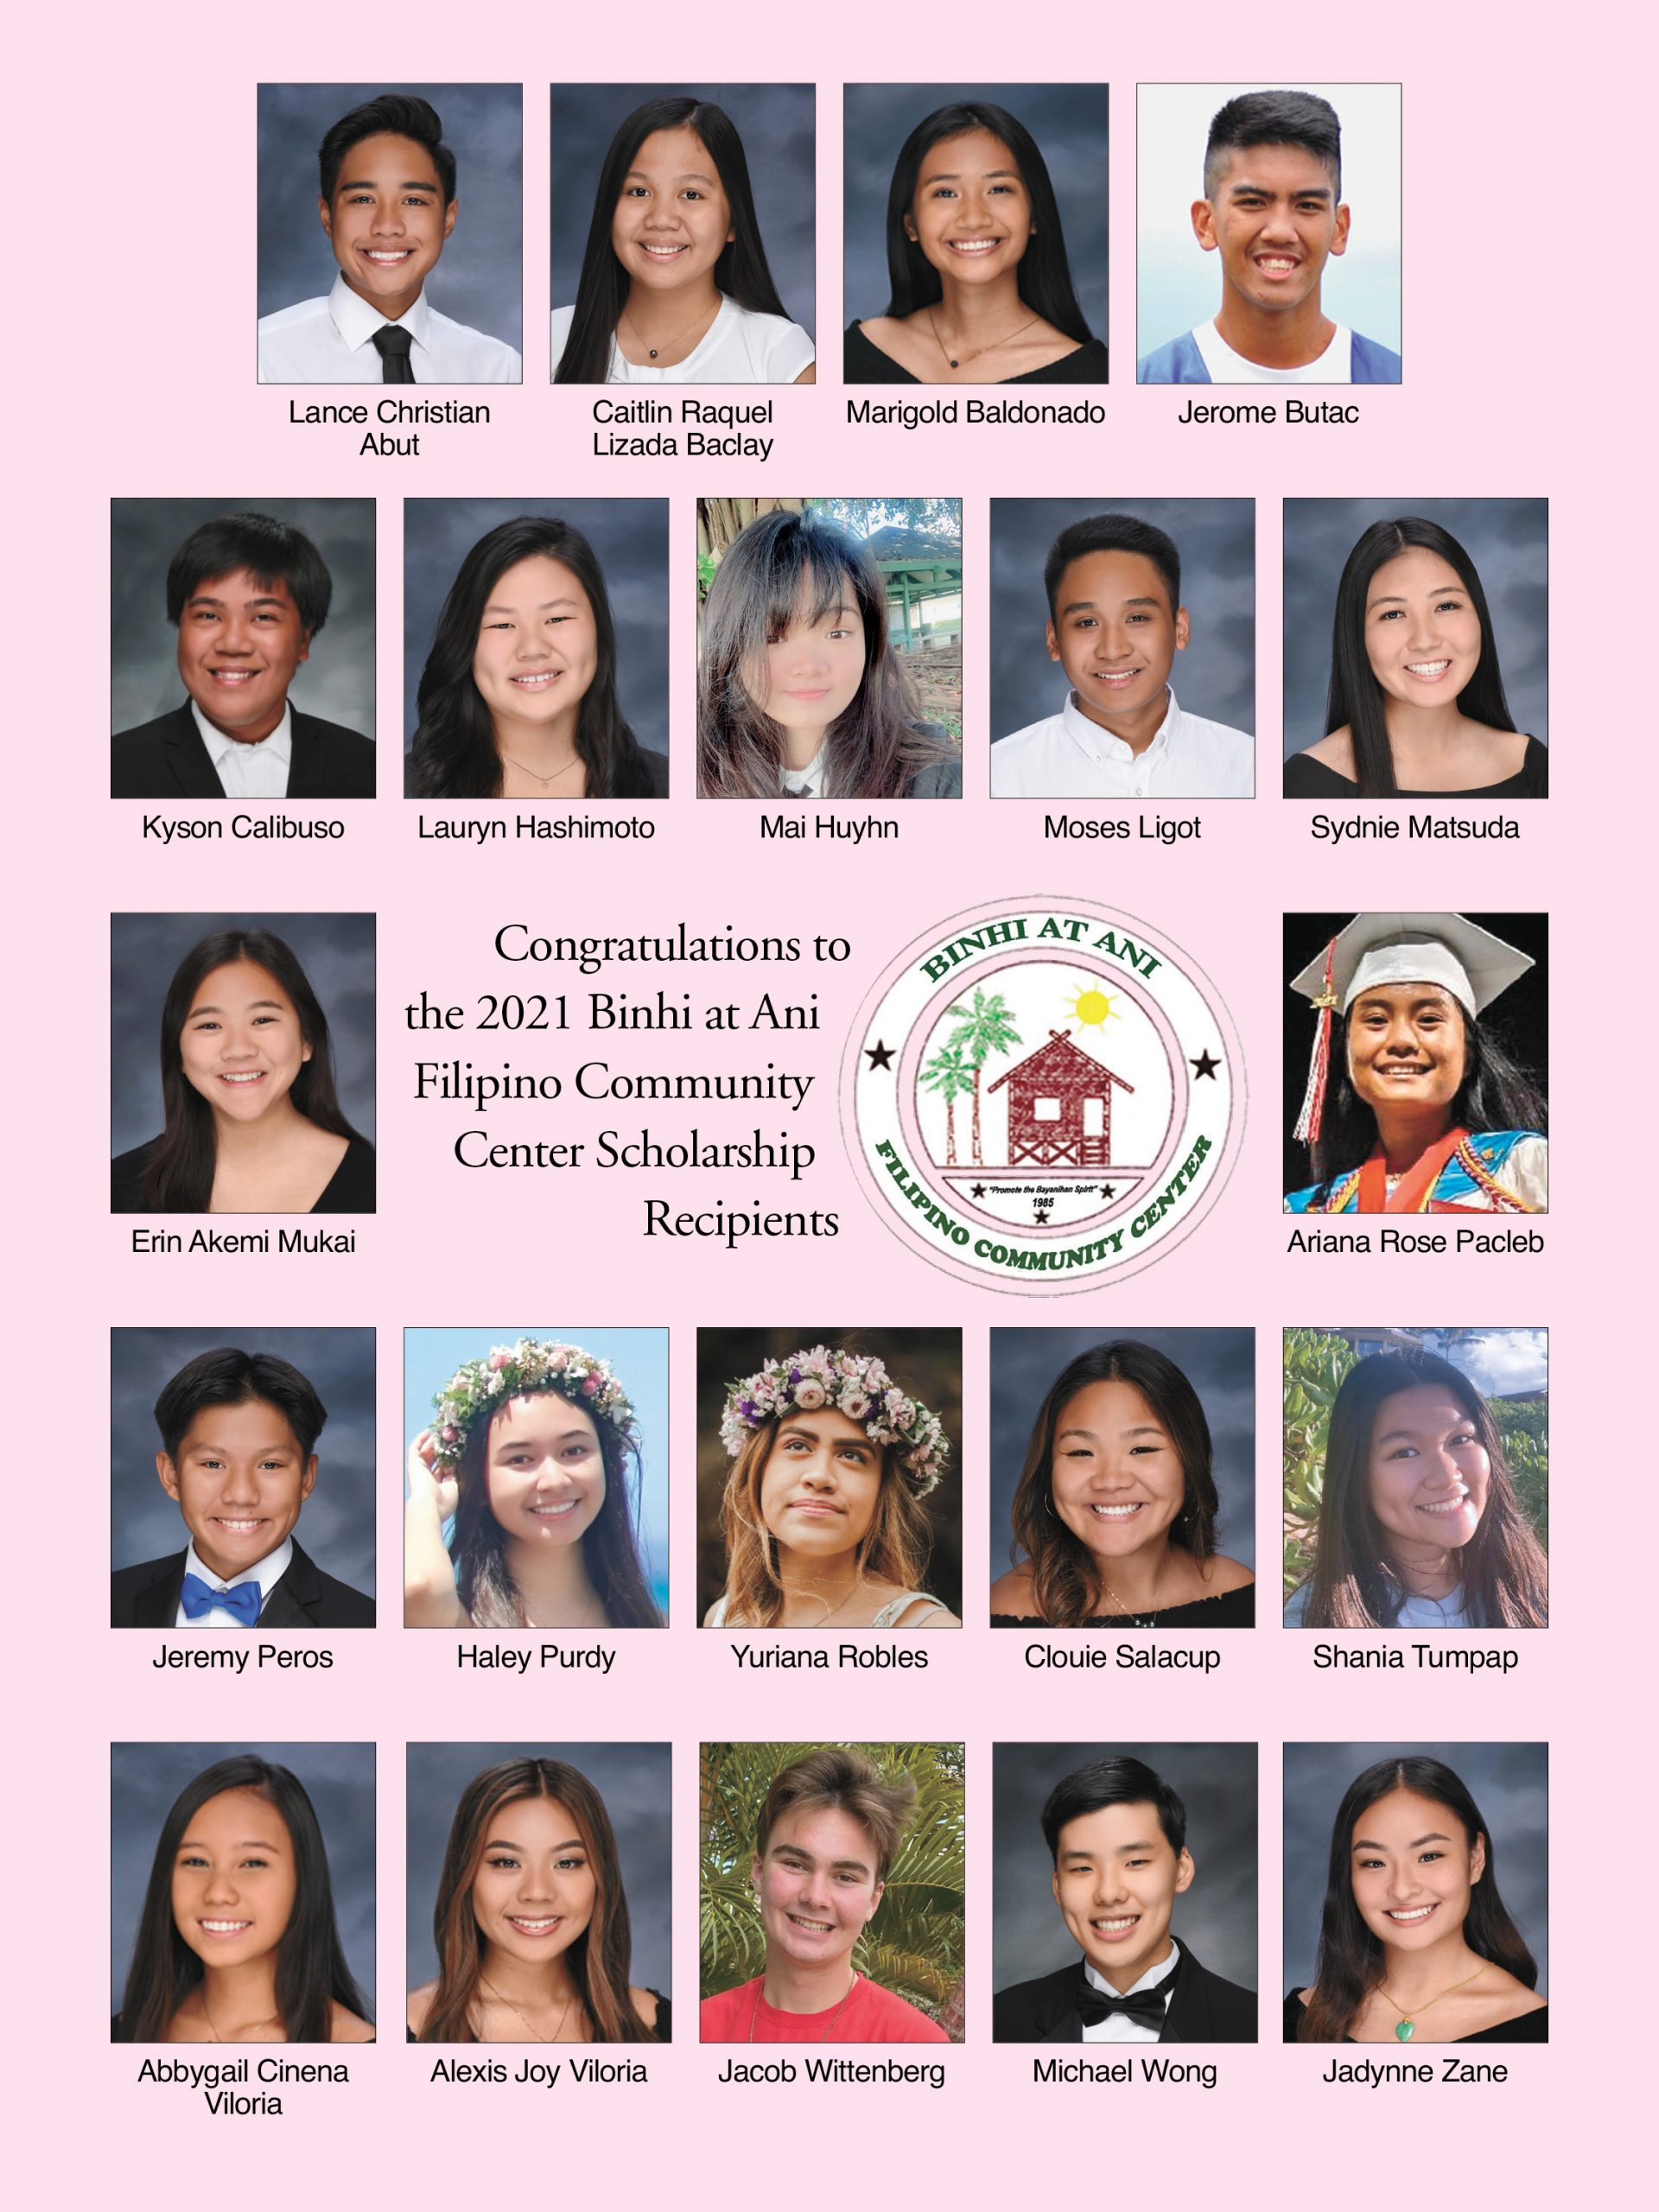 Binhi at Ani Awarding 21 Scholarships to the Class of 2021 on Maui